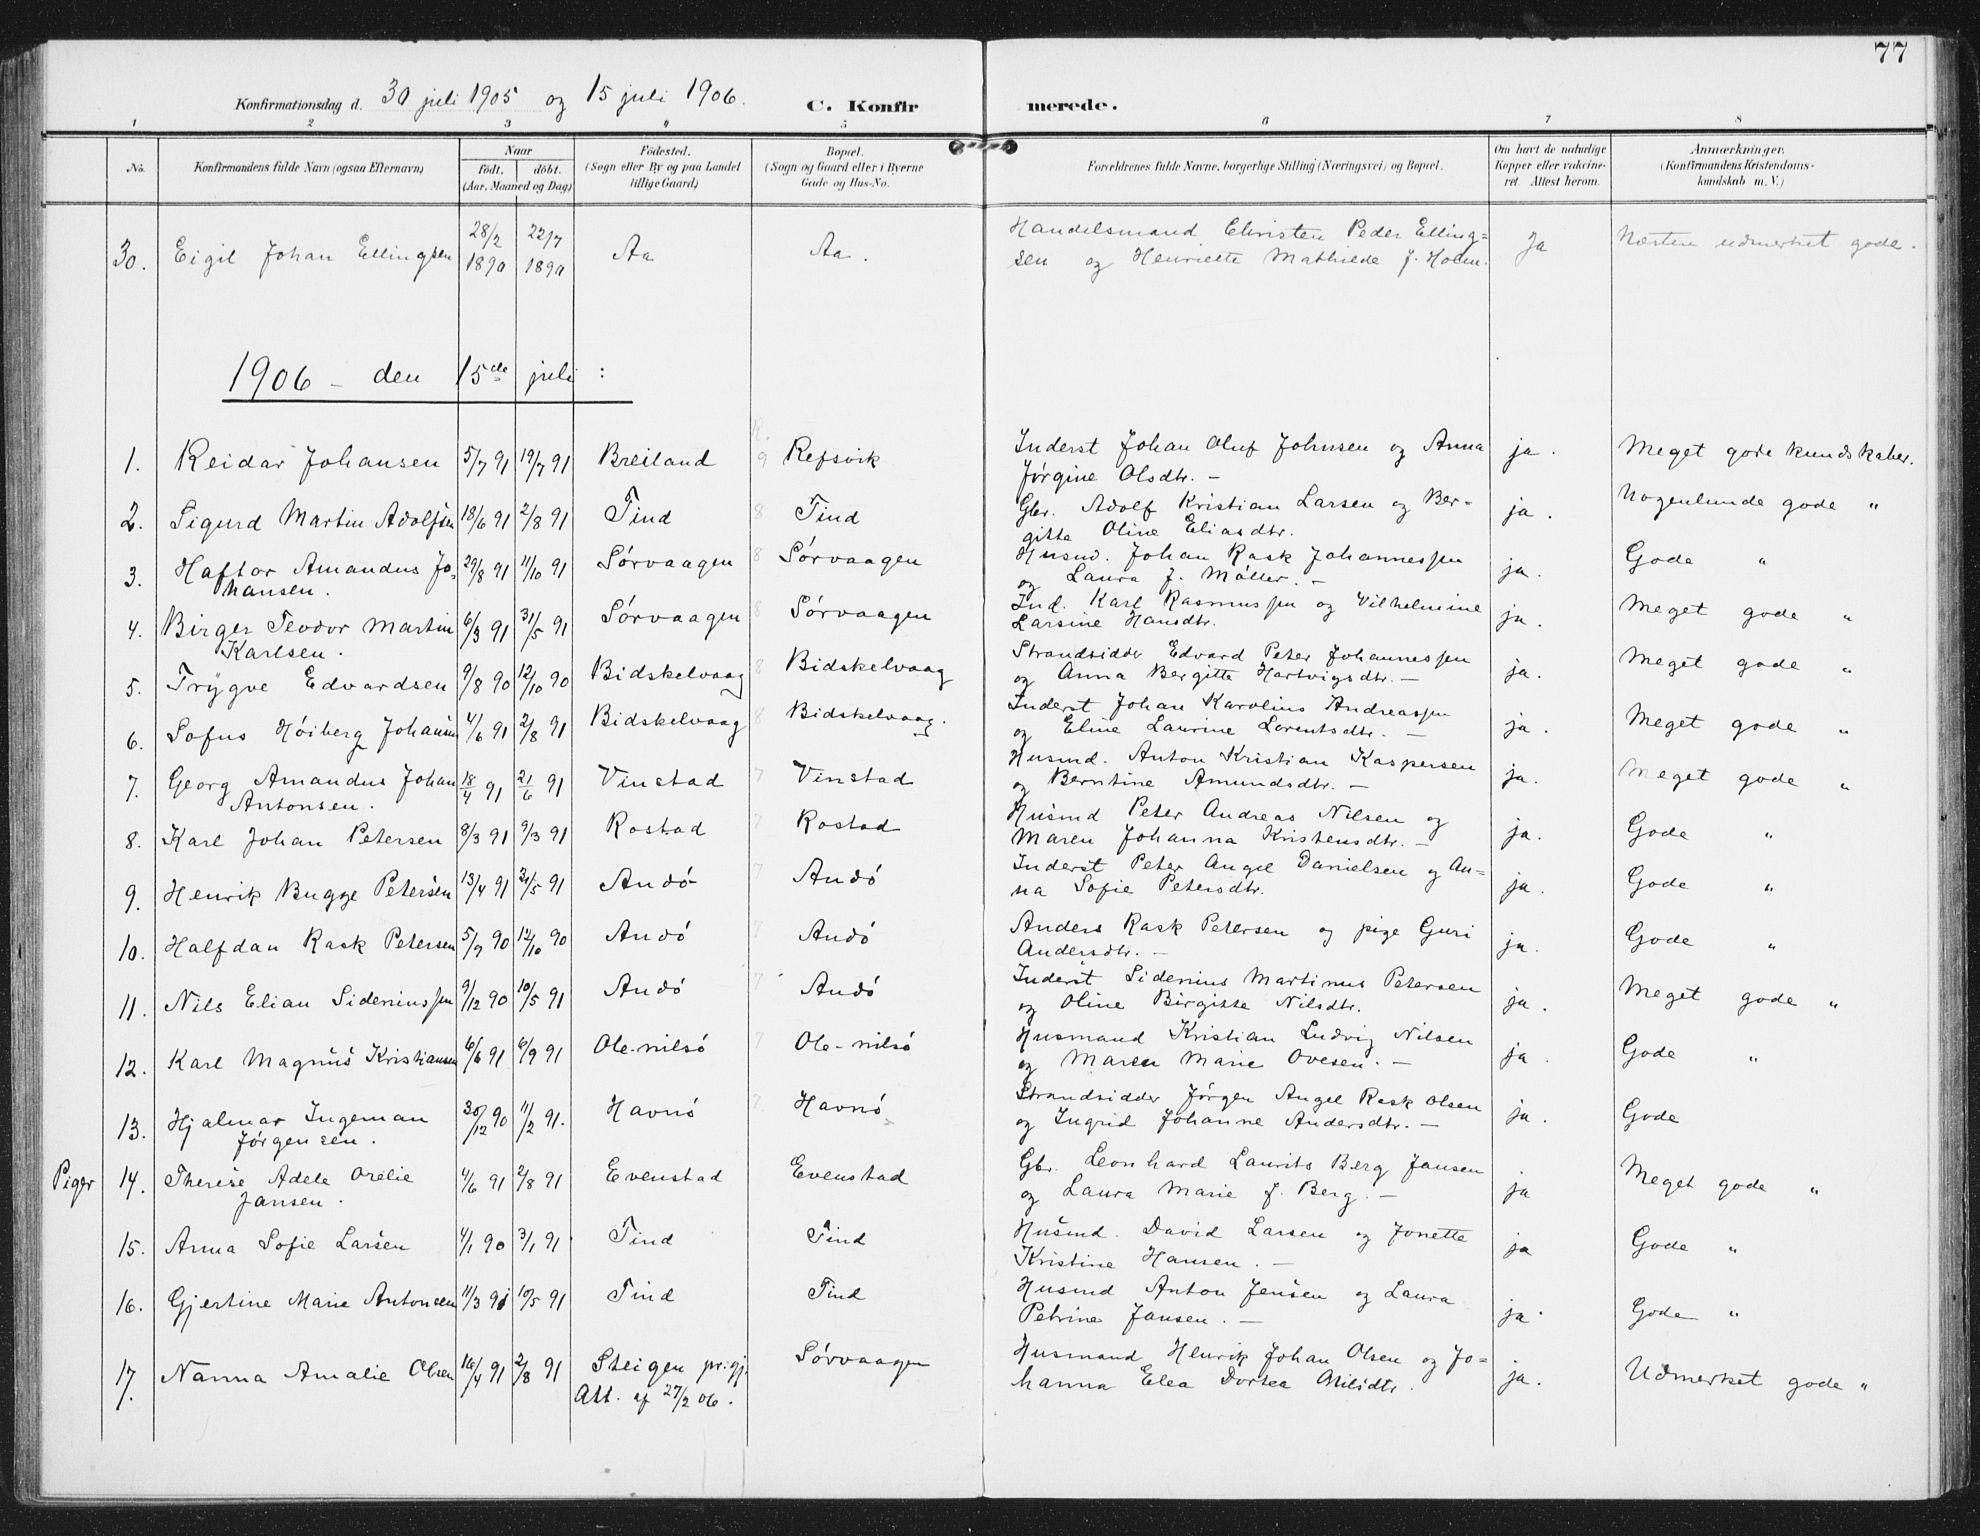 SAT, Ministerialprotokoller, klokkerbøker og fødselsregistre - Nordland, 886/L1221: Ministerialbok nr. 886A03, 1903-1913, s. 77